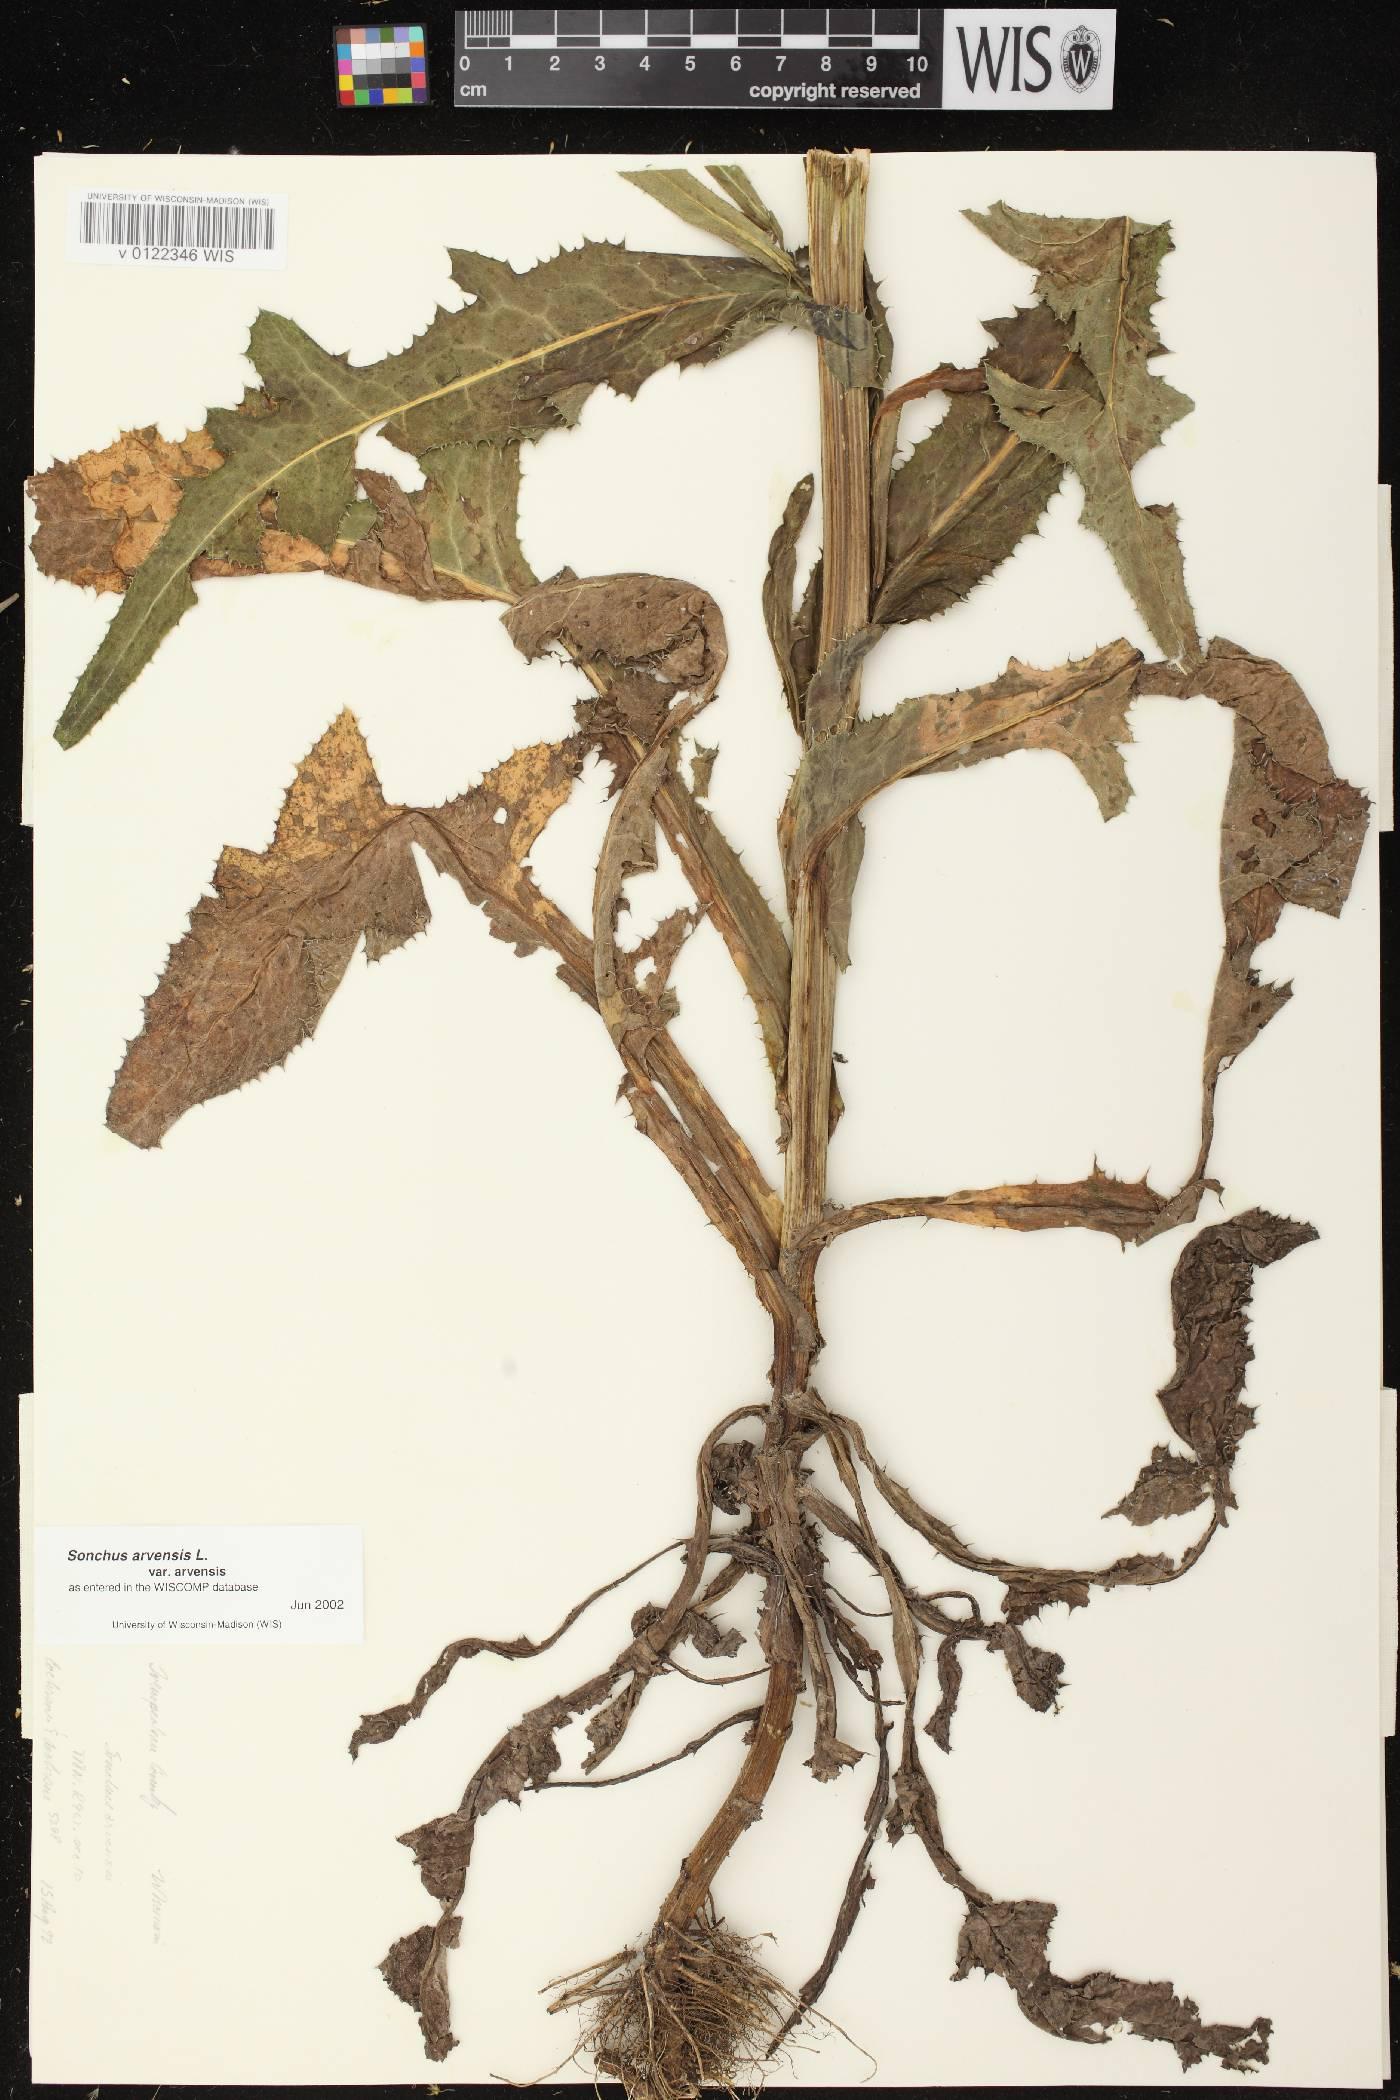 Sonchus arvensis subsp. arvensis image